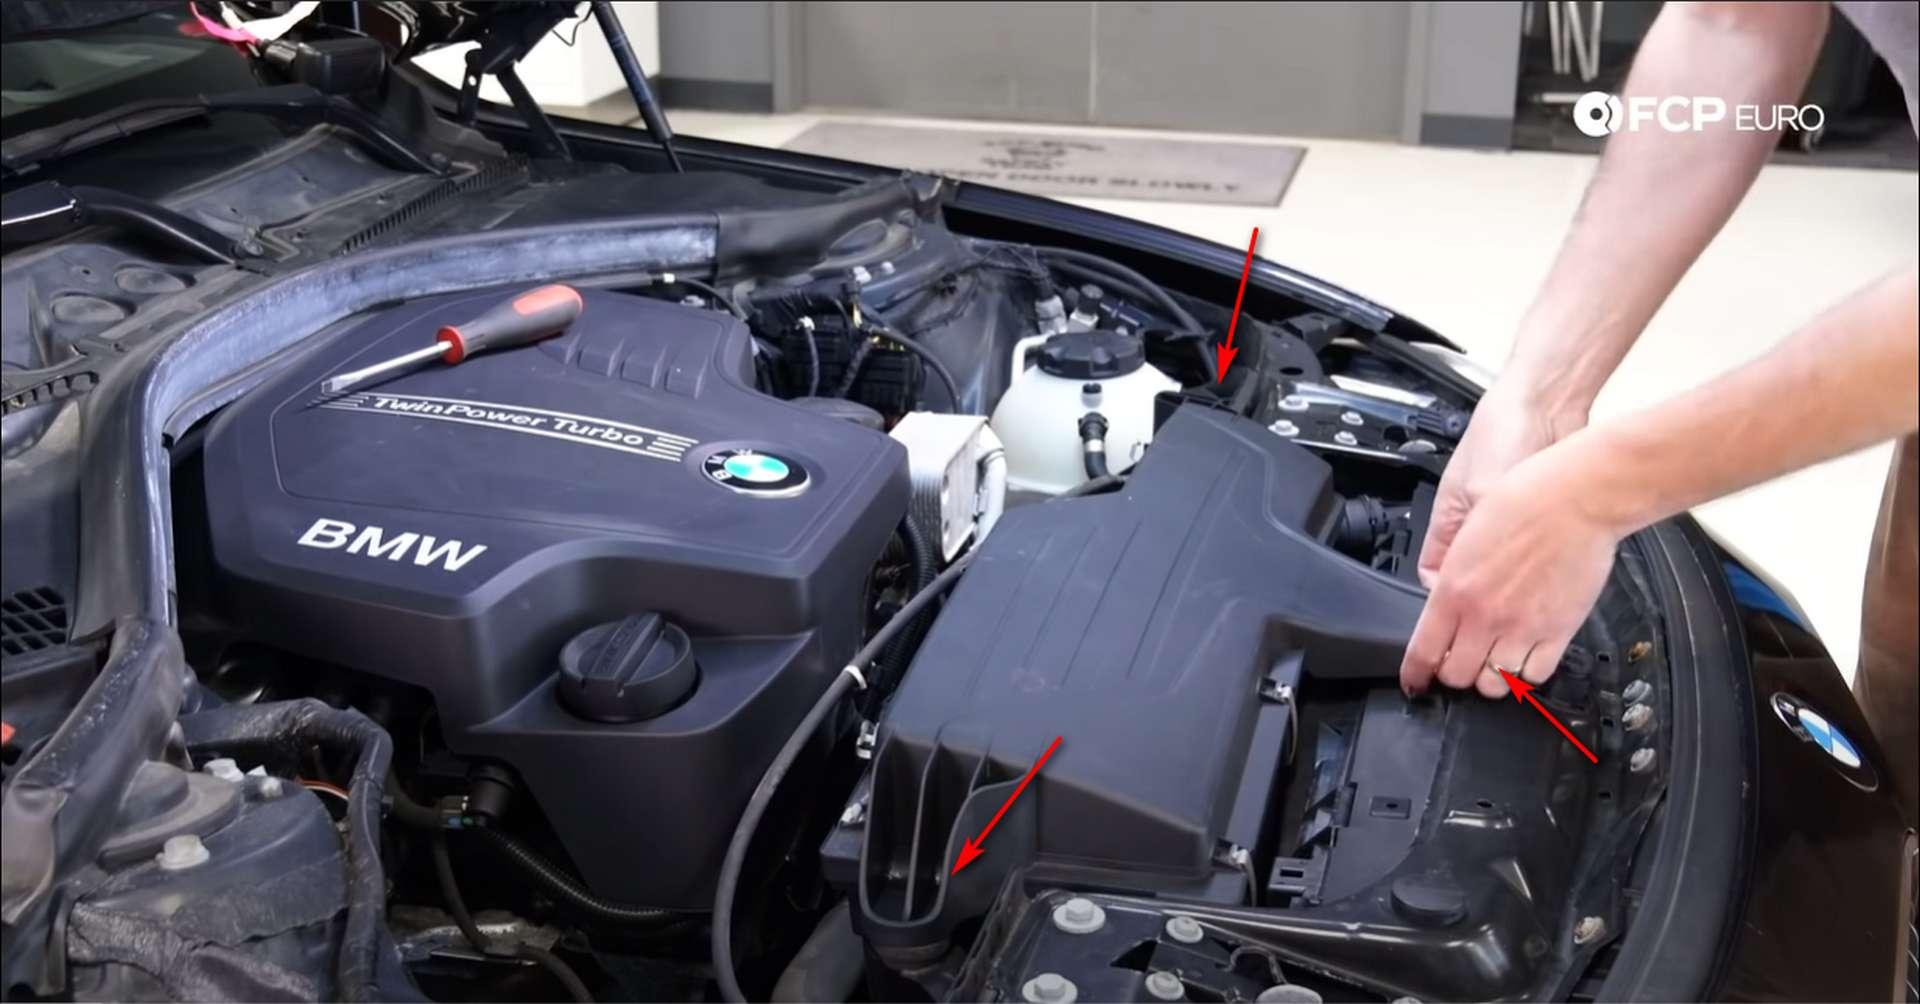 02-DIY-N20-Water-Pump-Thermostat-Replacement_Removing-Intake